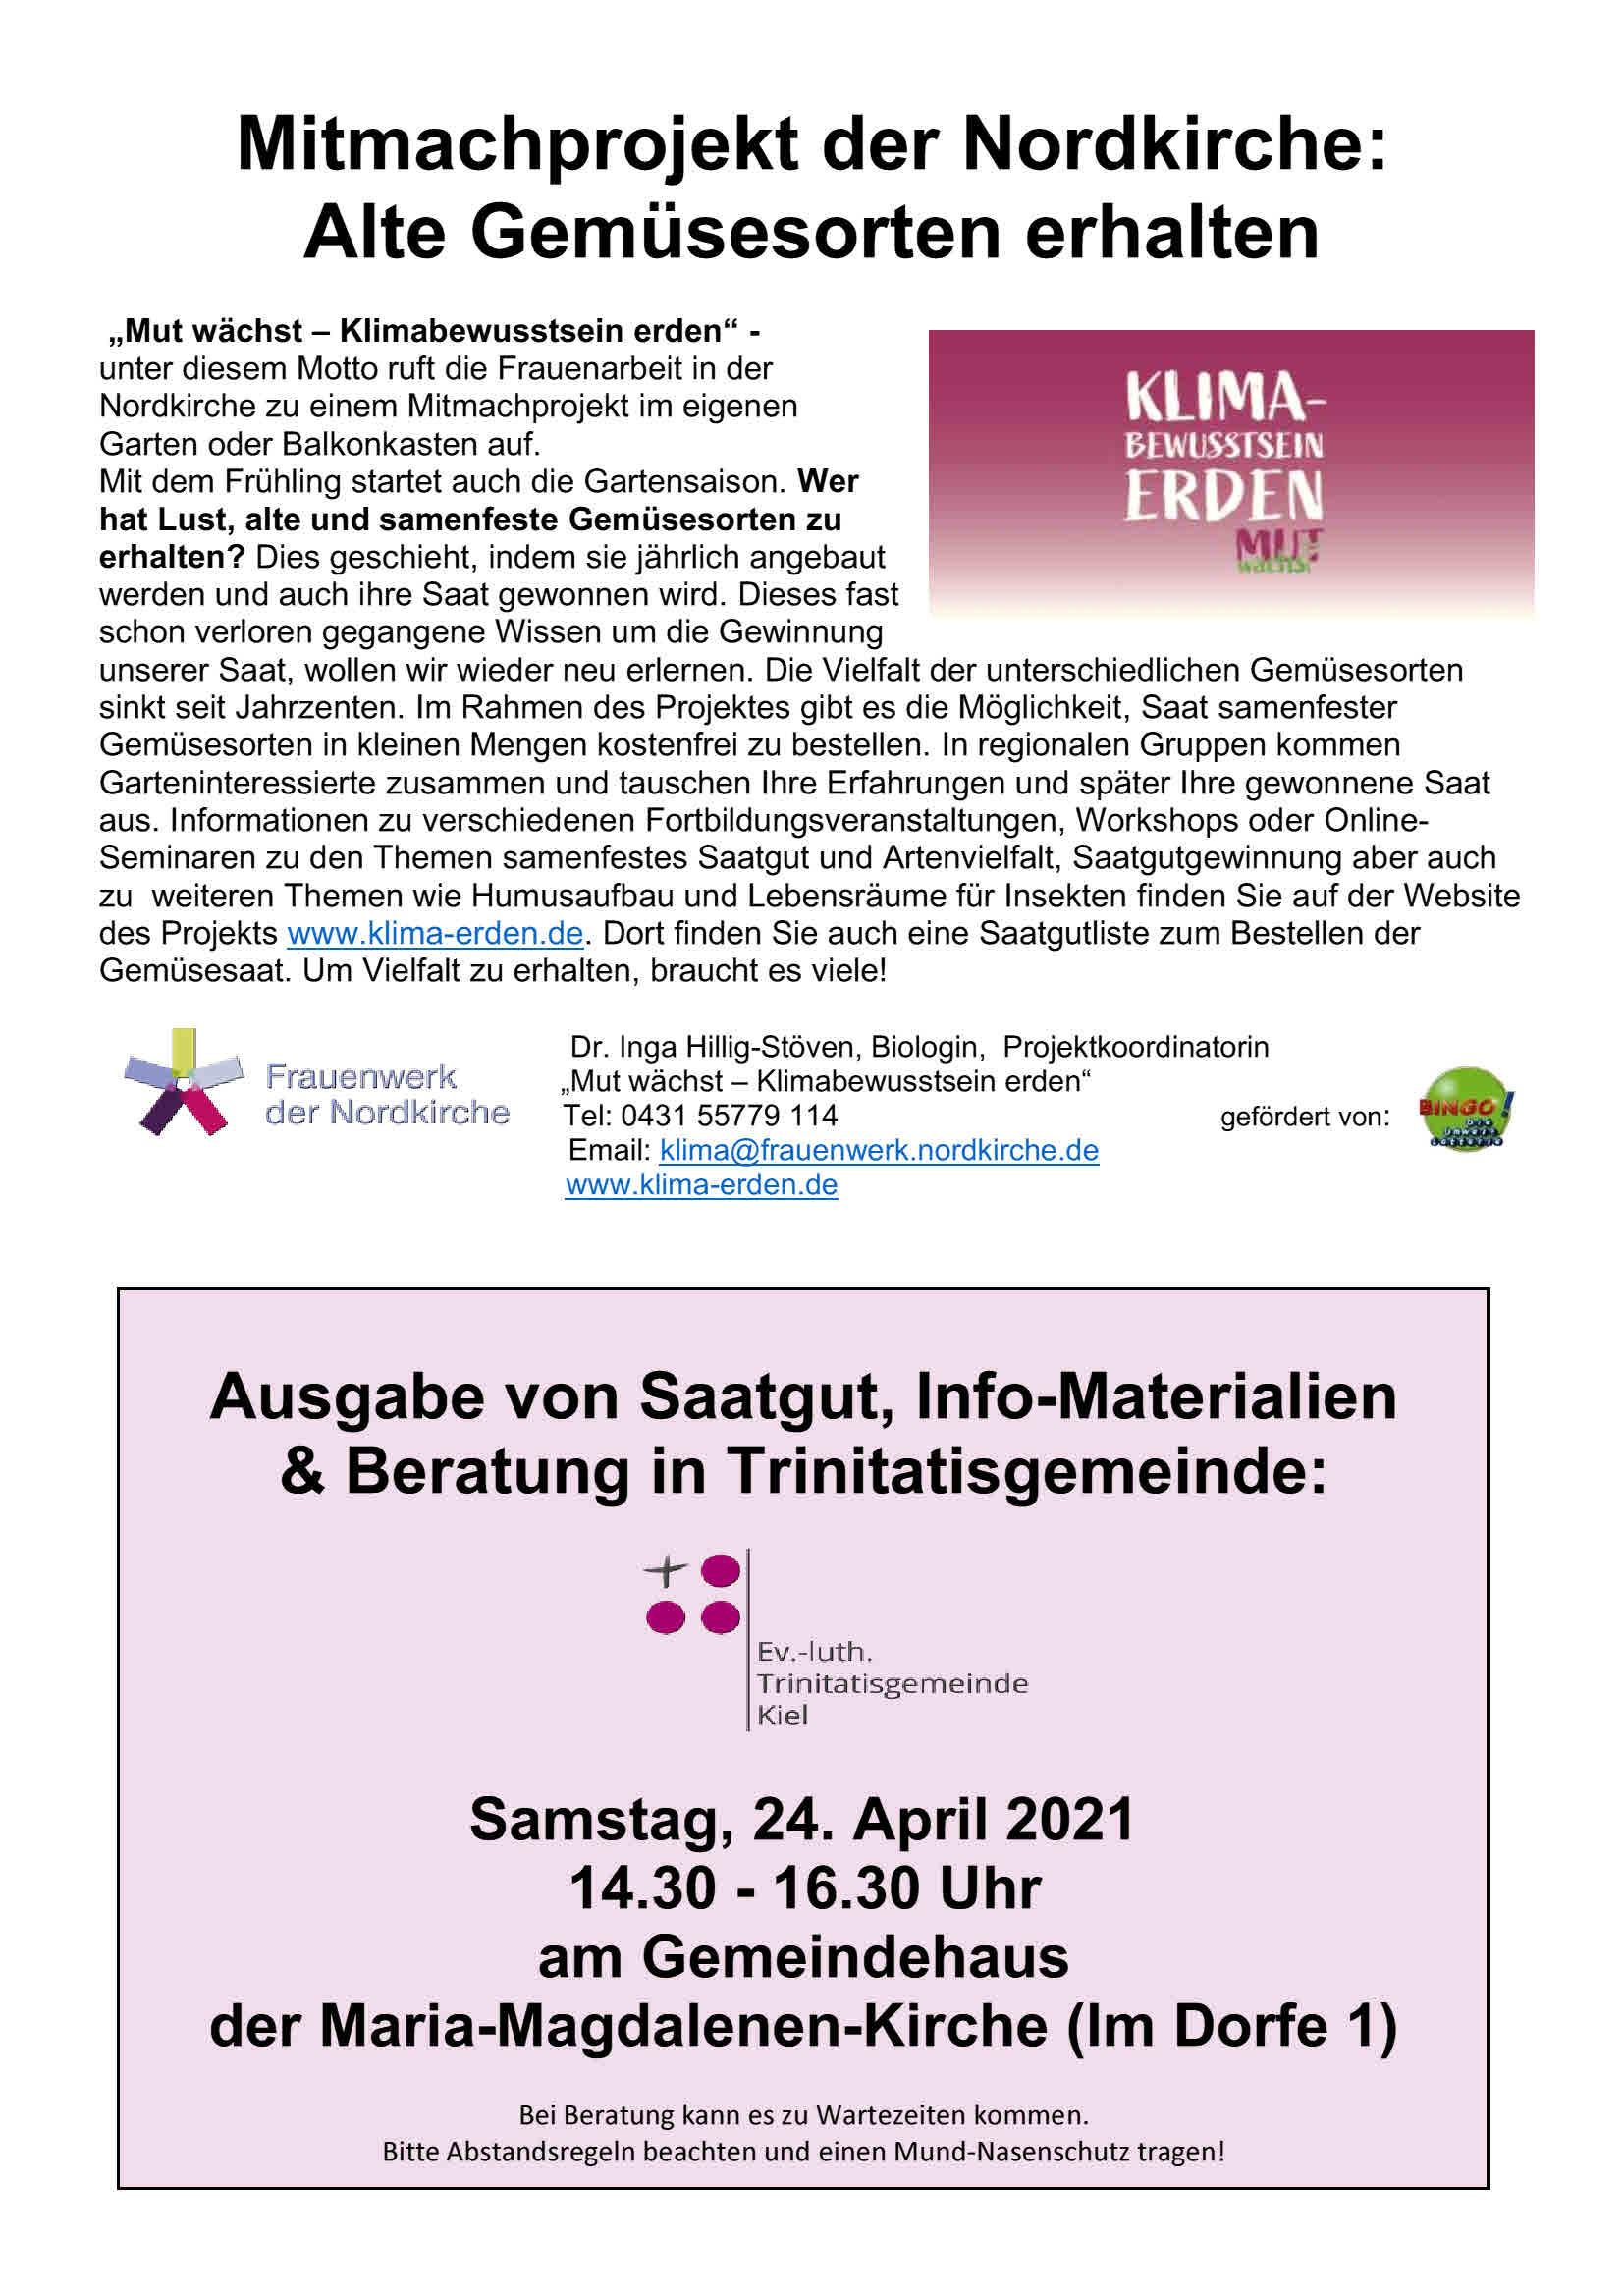 You are currently viewing Mit Kompost den Klimawandel stoppen / 24.April / Gemeindehaus MM